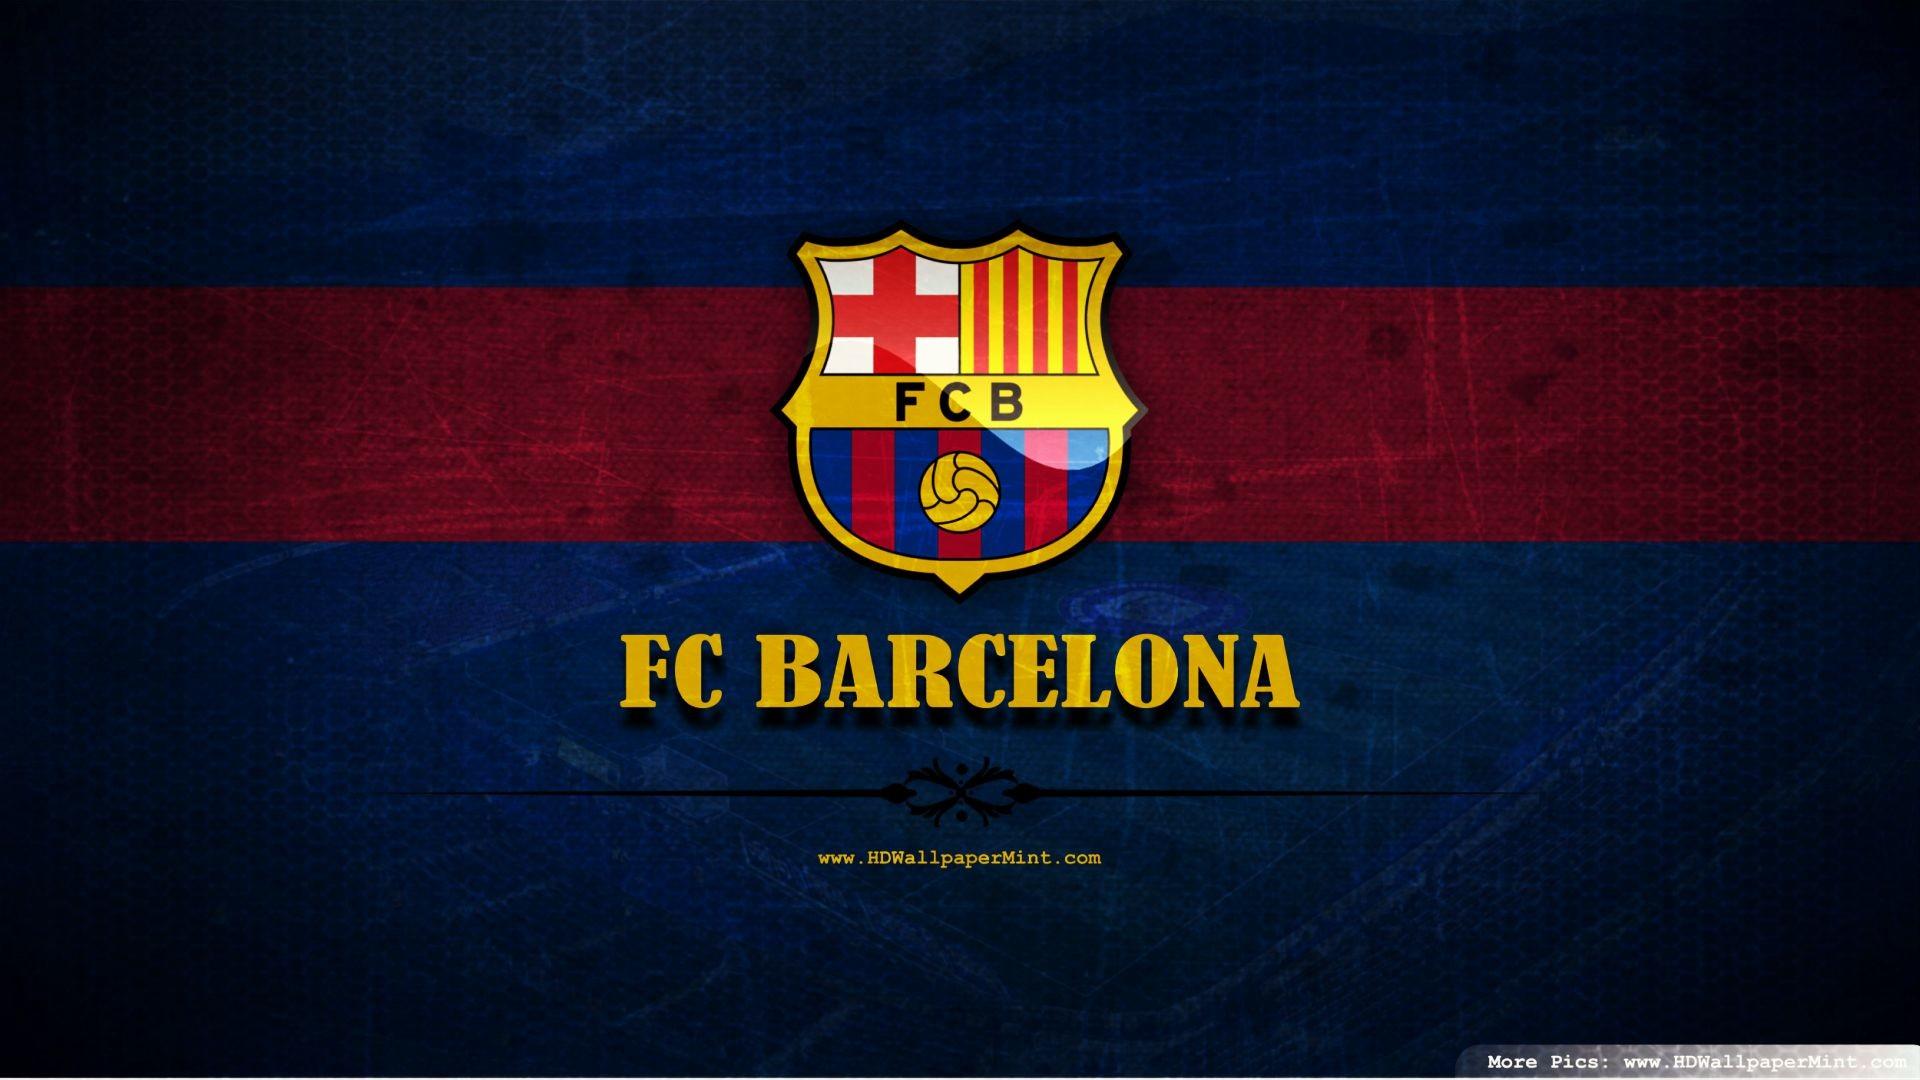 Barcelona Football Club Wallpaper – Football Wallpaper HD | Adorable  Wallpapers | Pinterest | Barcelona football, Football wallpaper and  Wallpaper